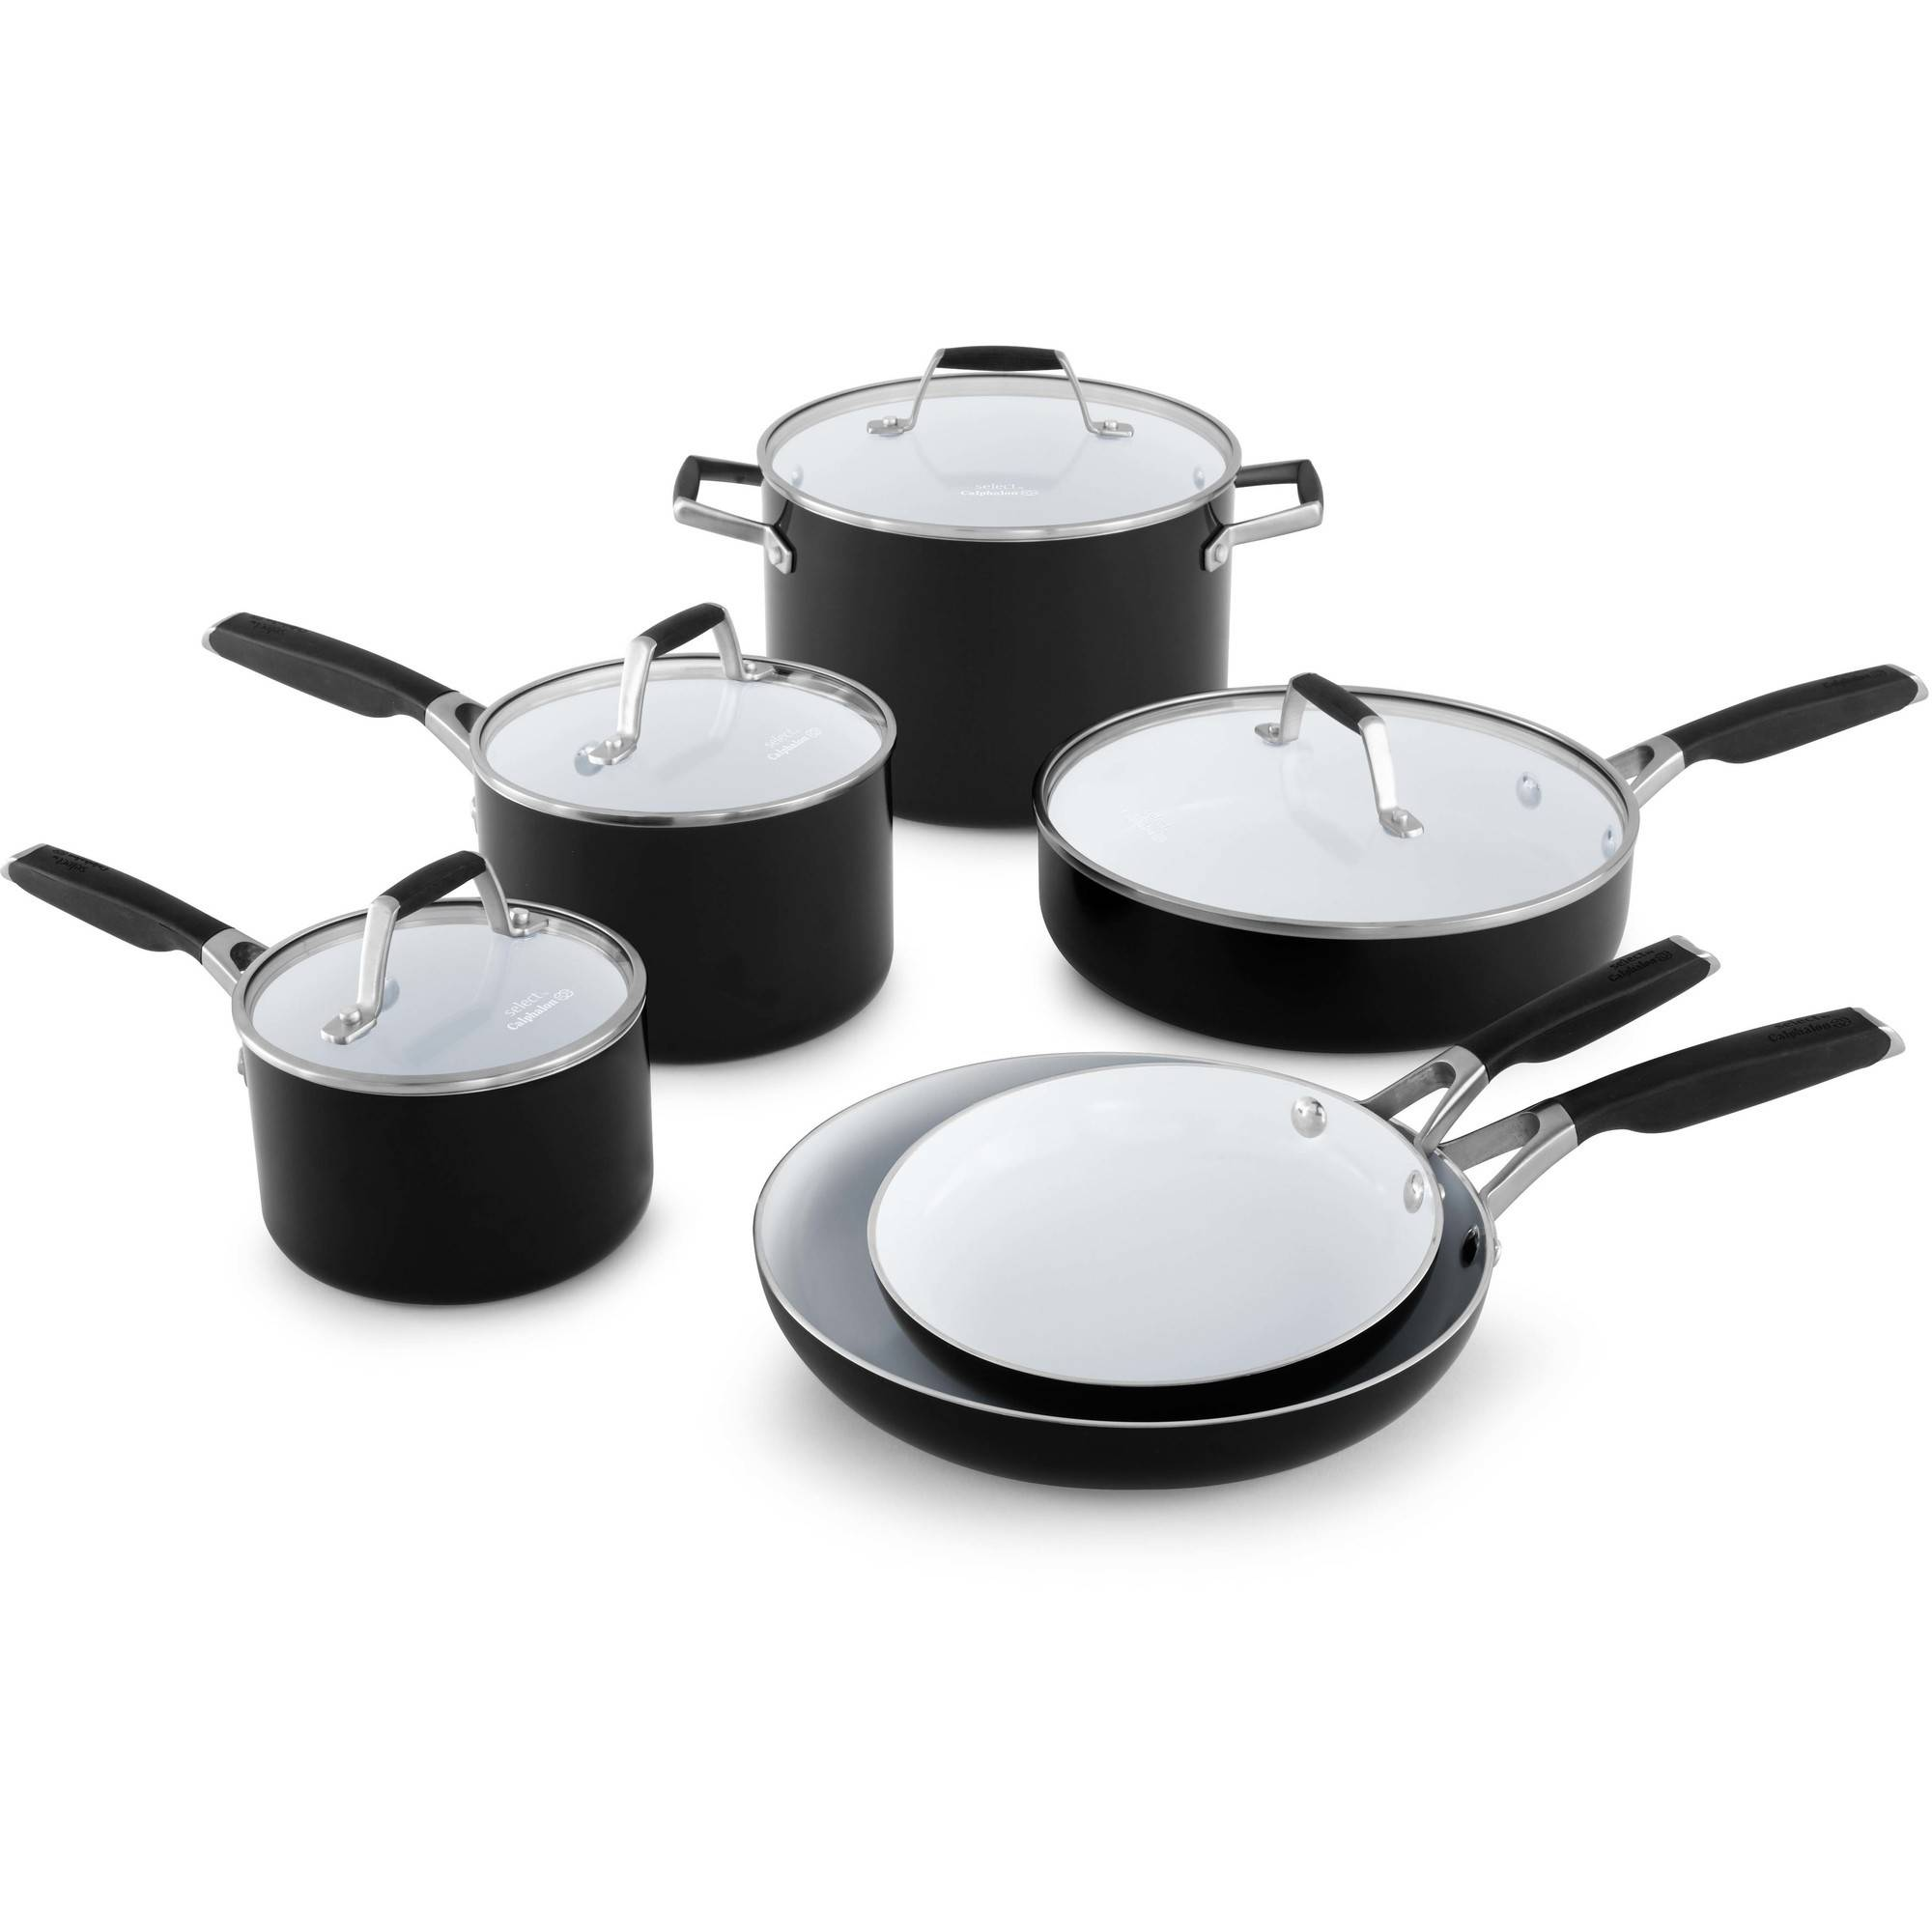 Cookware gt see more select by calphalon ceramic nonstick 8 inch an - Select By Calphalon Ceramic Nonstick 10 Piece Cookware Set Walmart Com